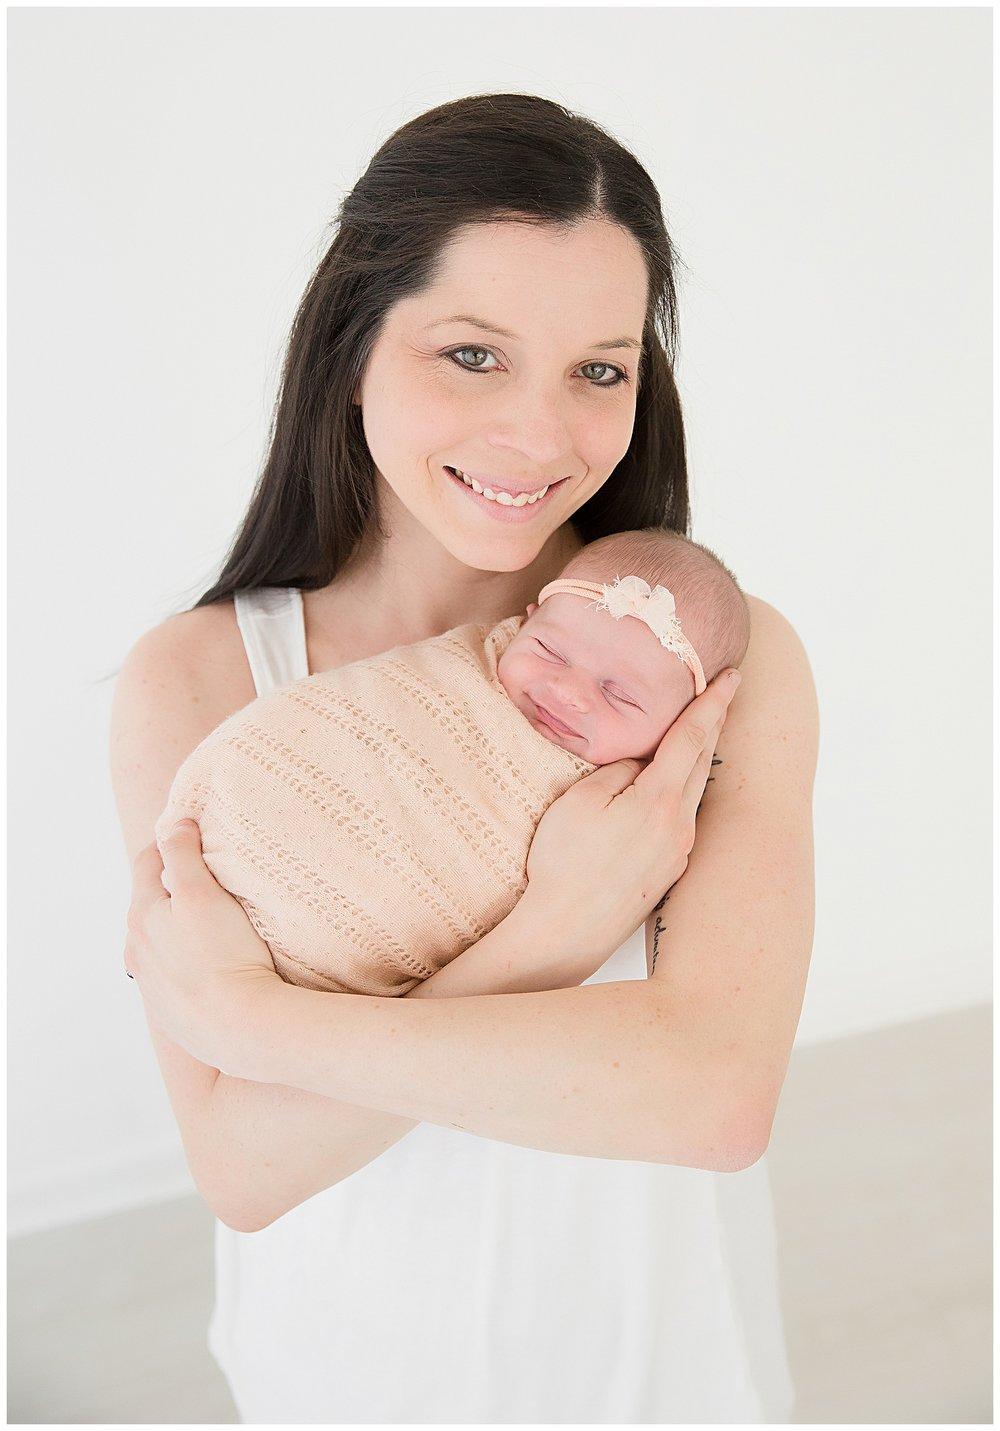 mom holding her baby girl smiling